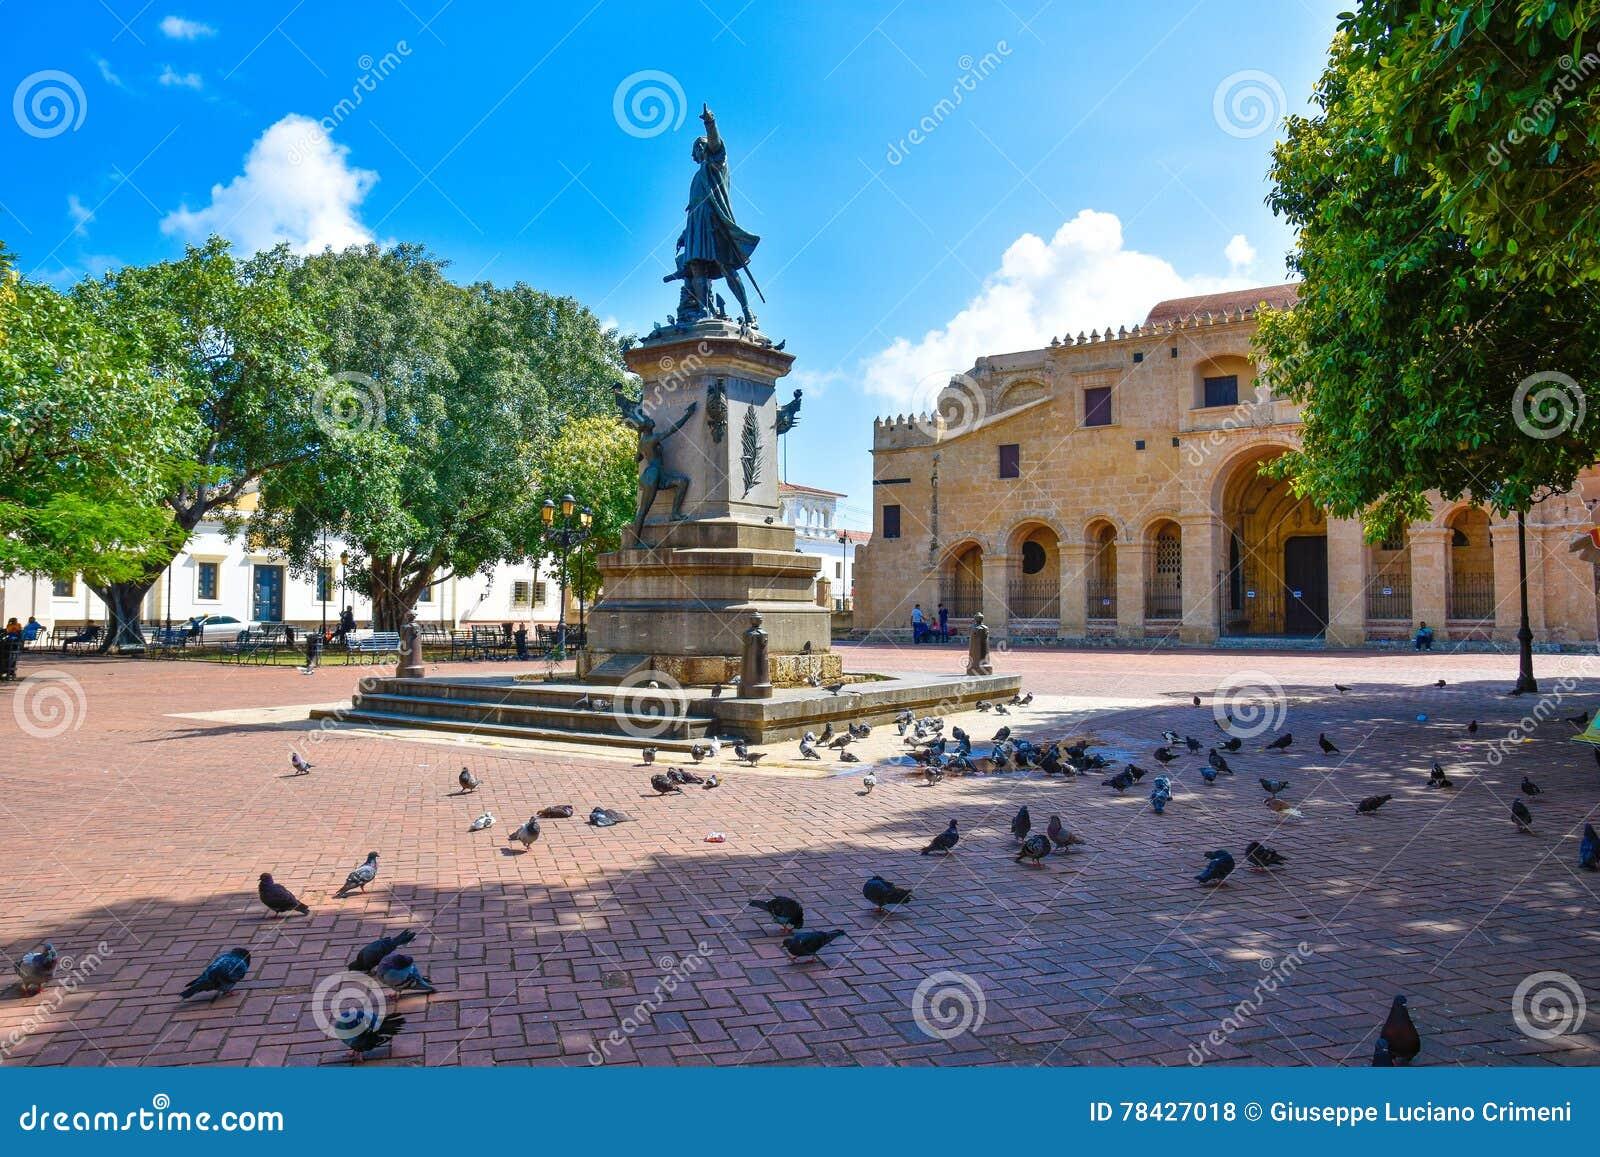 Santo Domingo, Dominican Republic. Famous Christopher